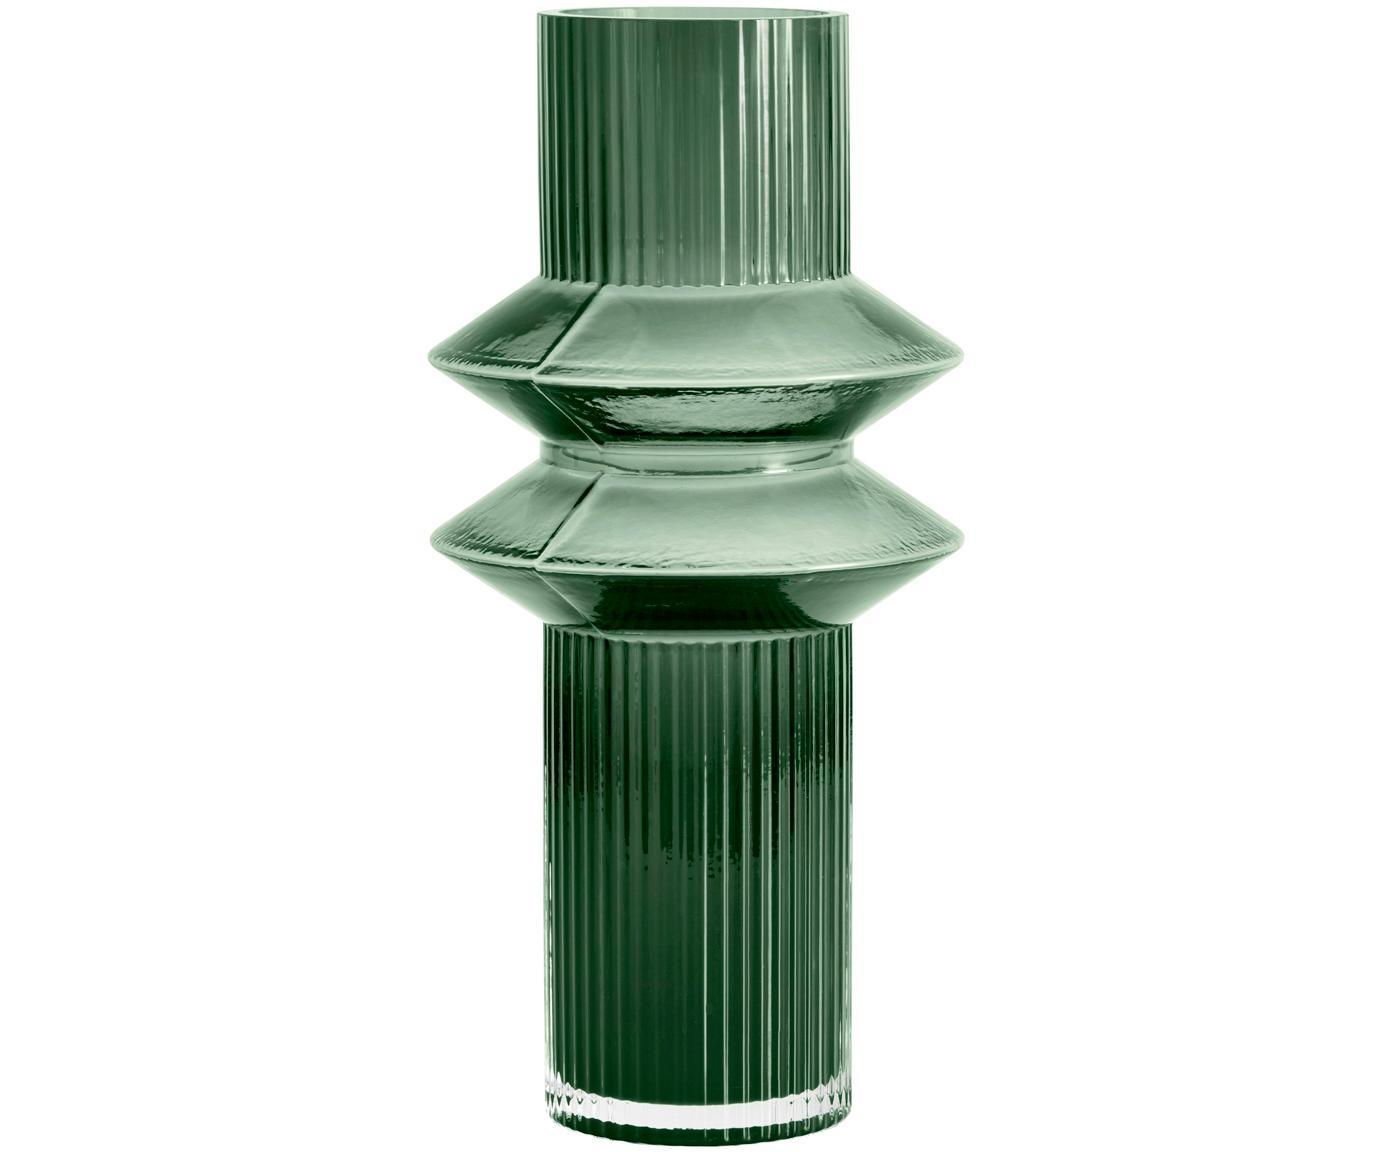 Glazen vaas Rilla, Glas, Groen, Ø 9 x H 32 cm